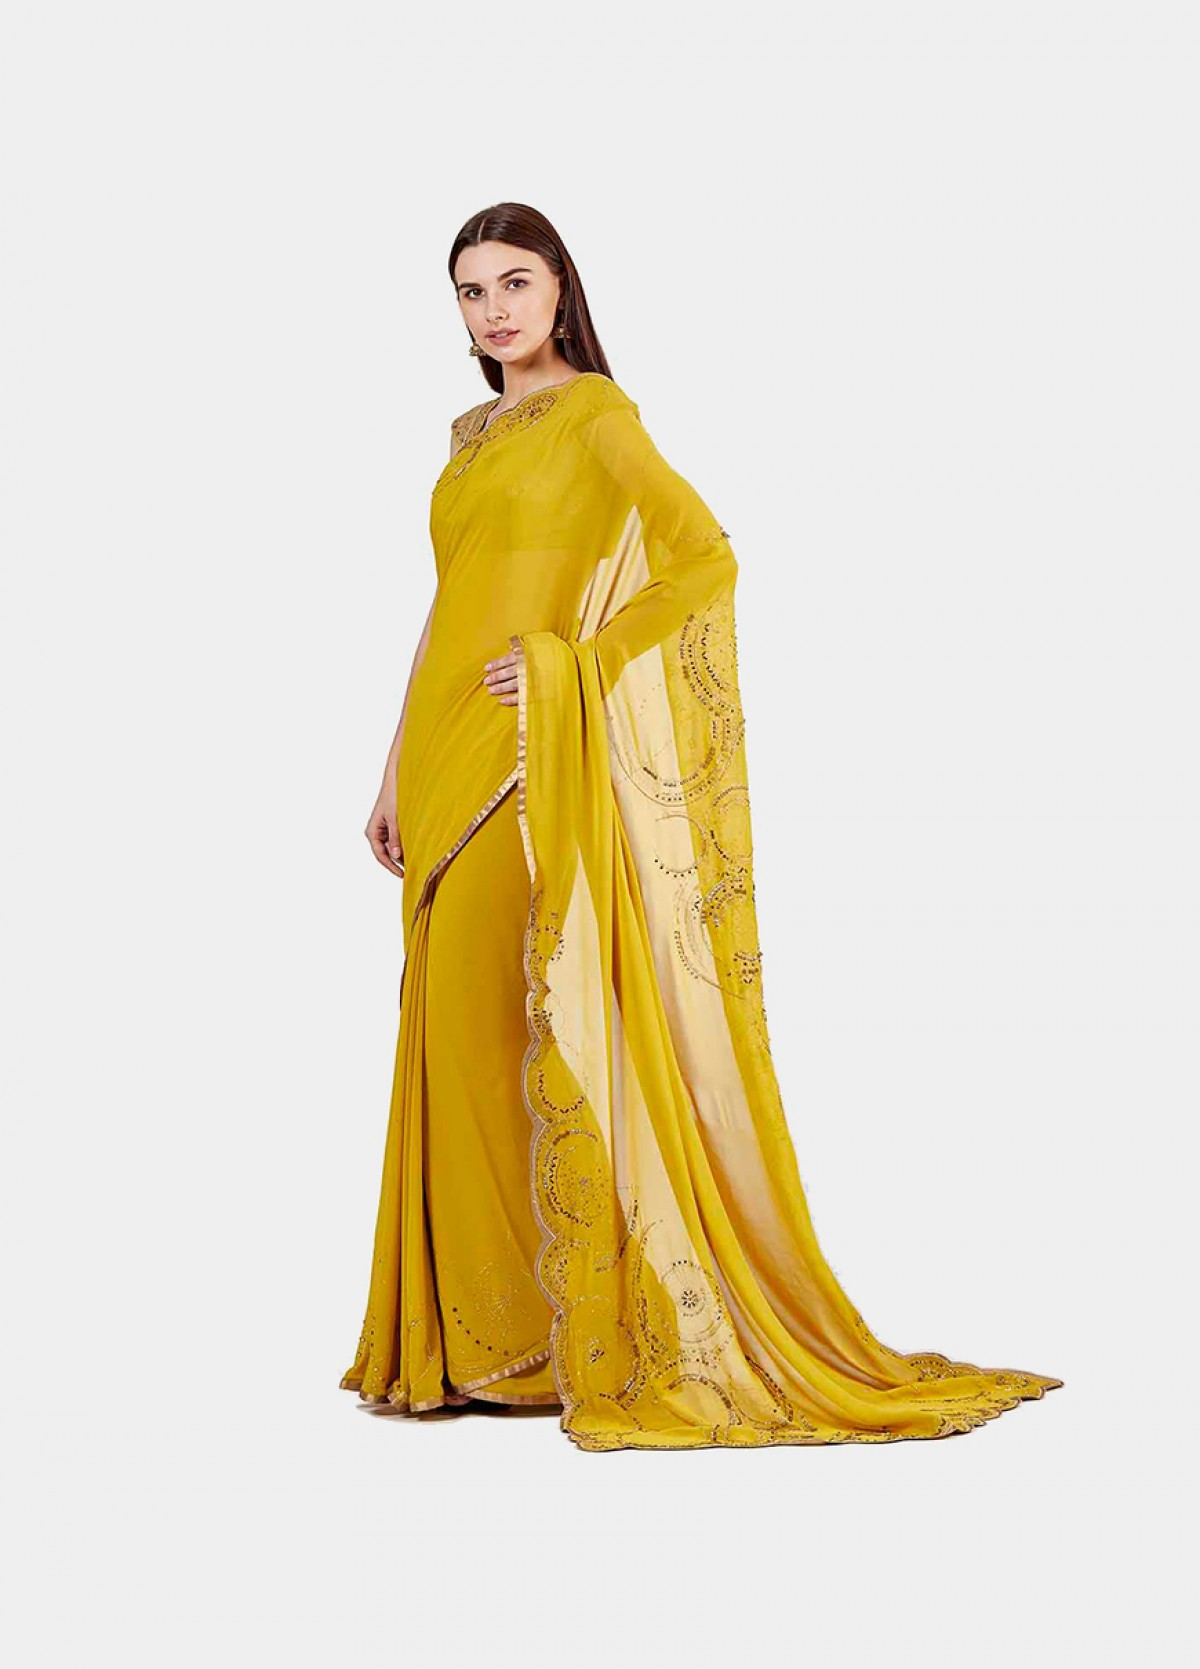 The Scalloped Compass Sari